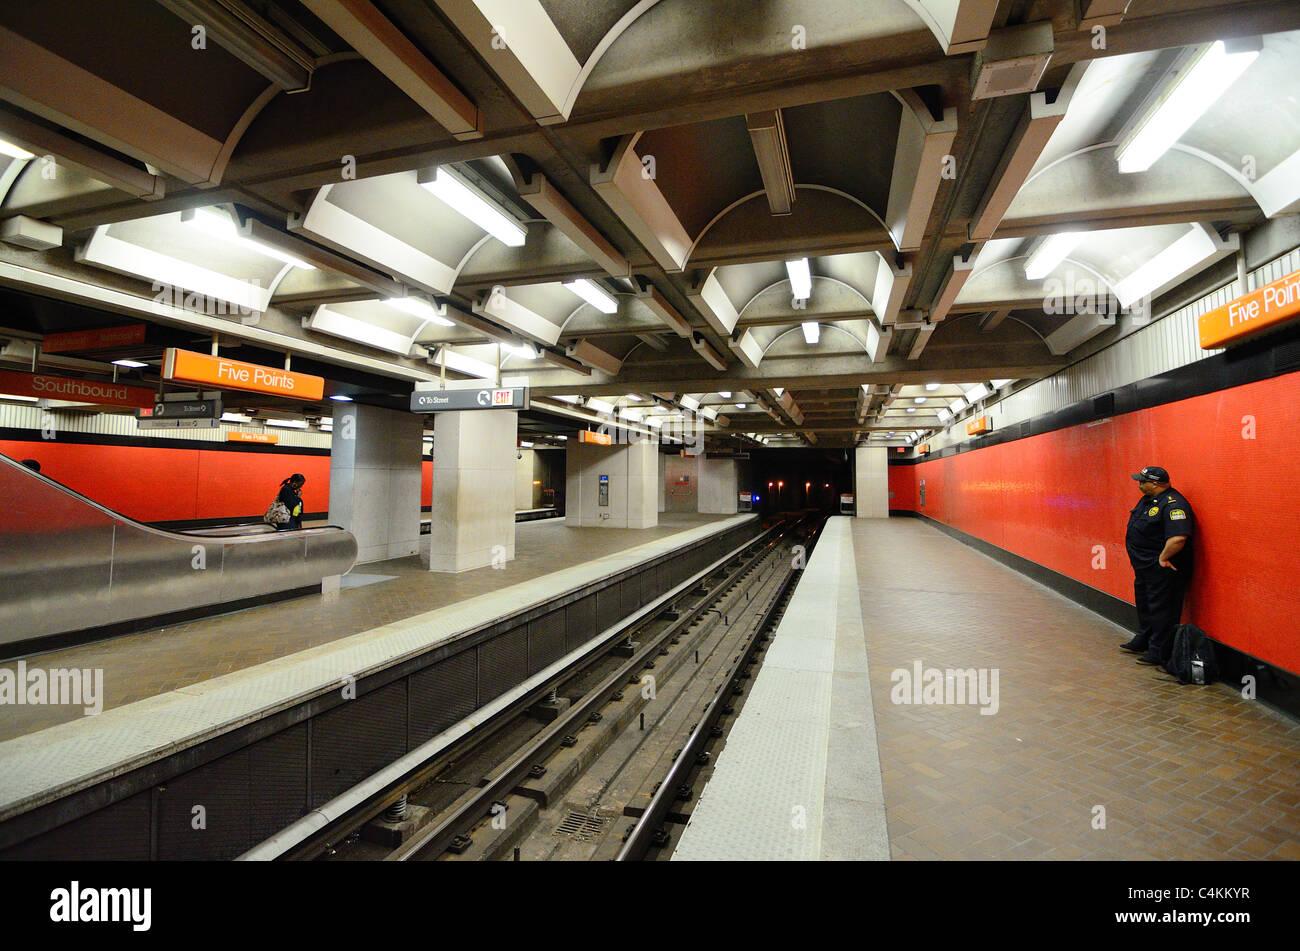 Platform at Five Points Station, part of Metropolitan Atlanta Rapid Transit Authority (MARTA) in Atlanta, Georgia. - Stock Image